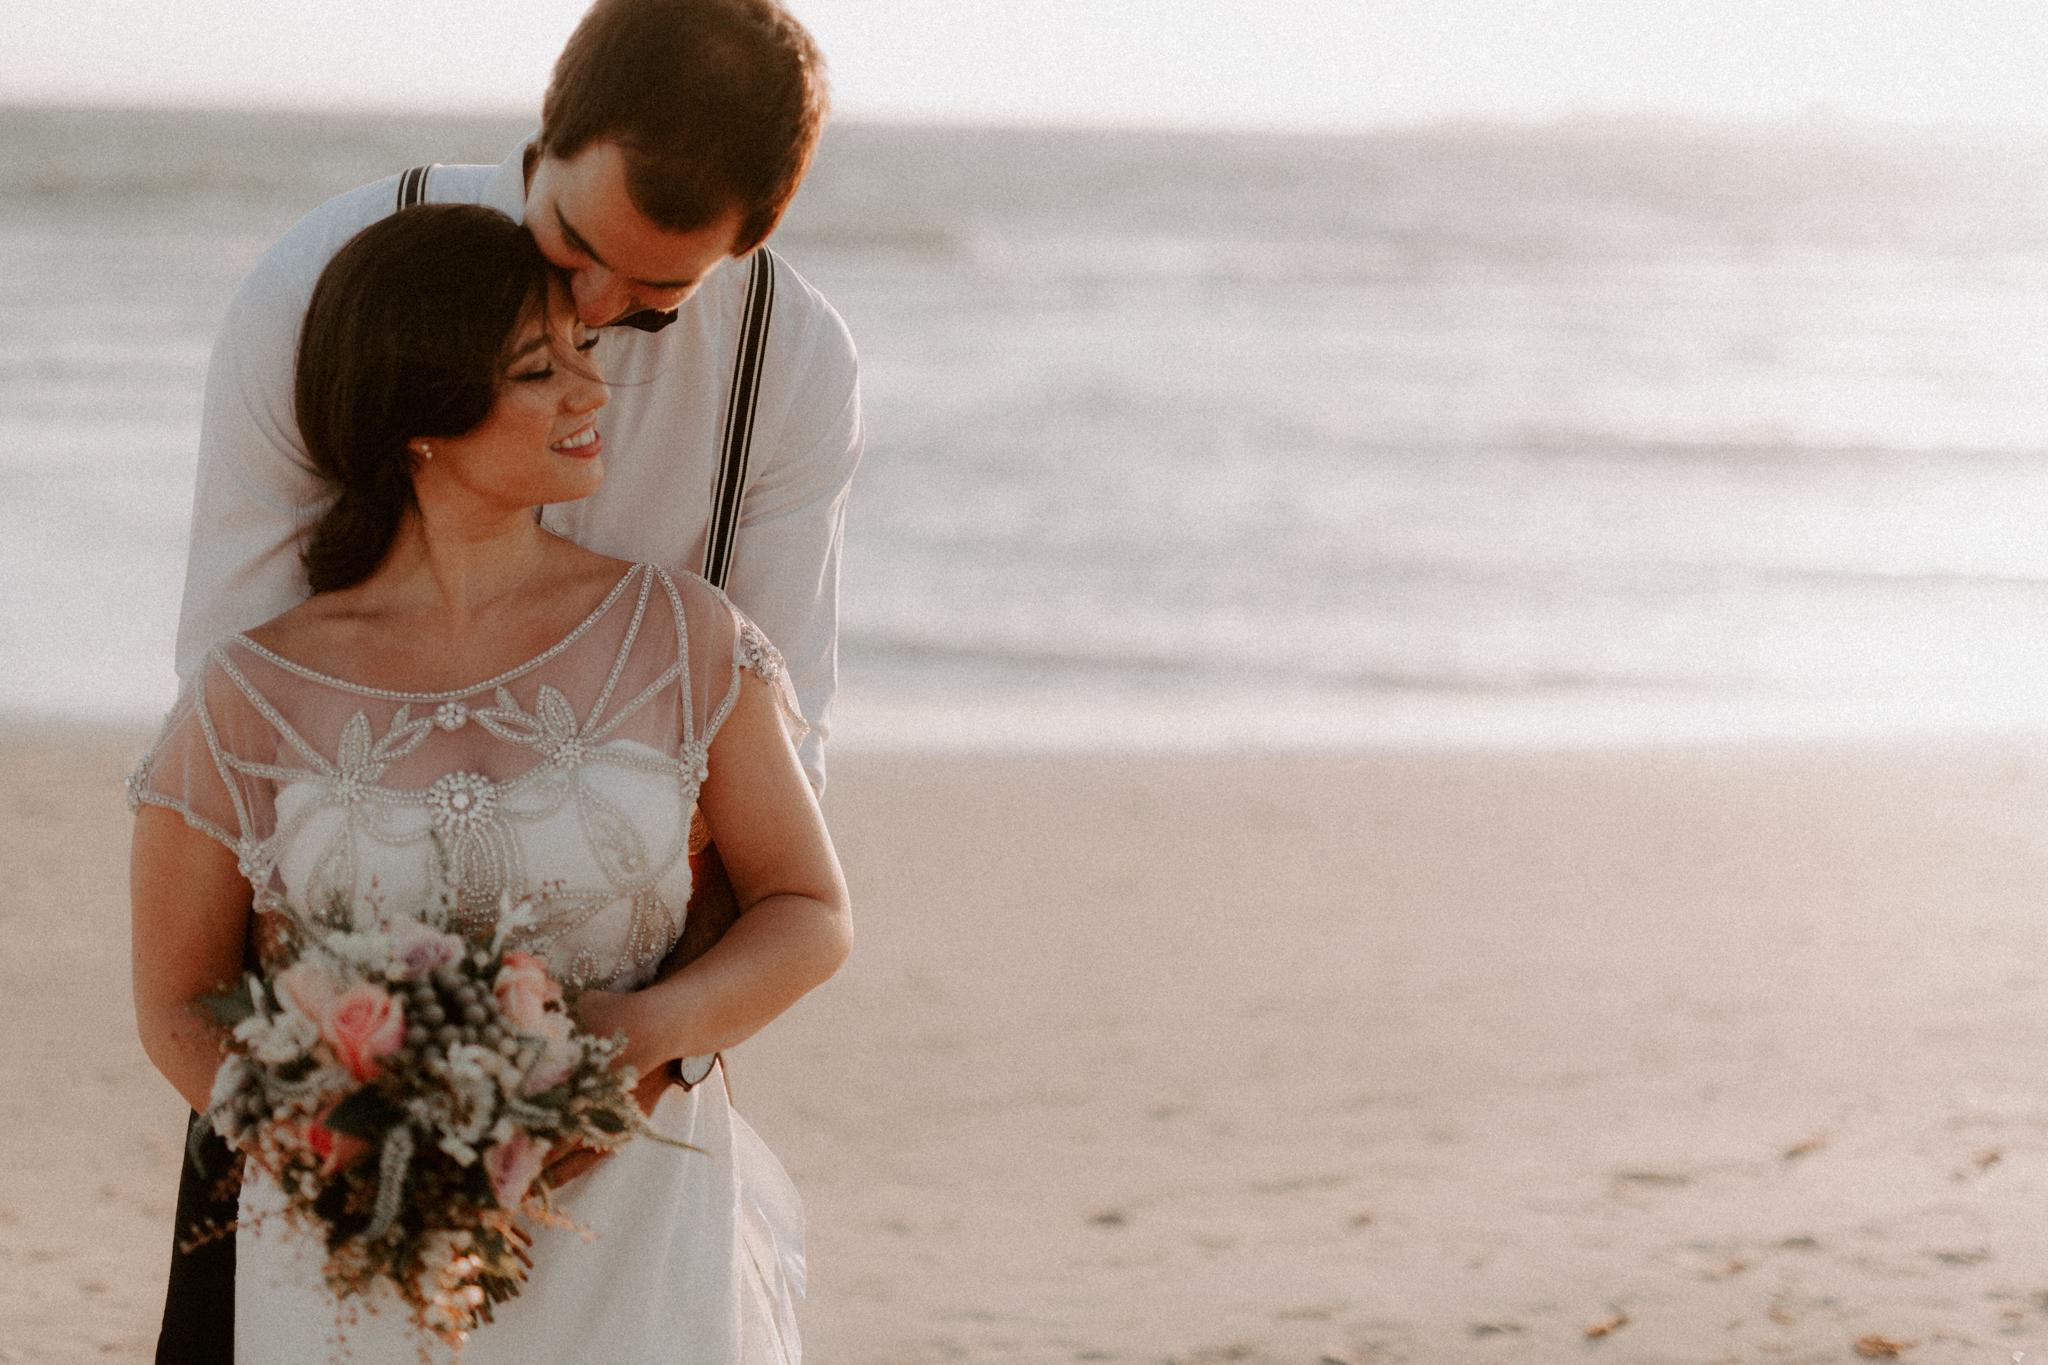 St-Ali-Wedding-Emotions-and-Math-Photography-078.jpg